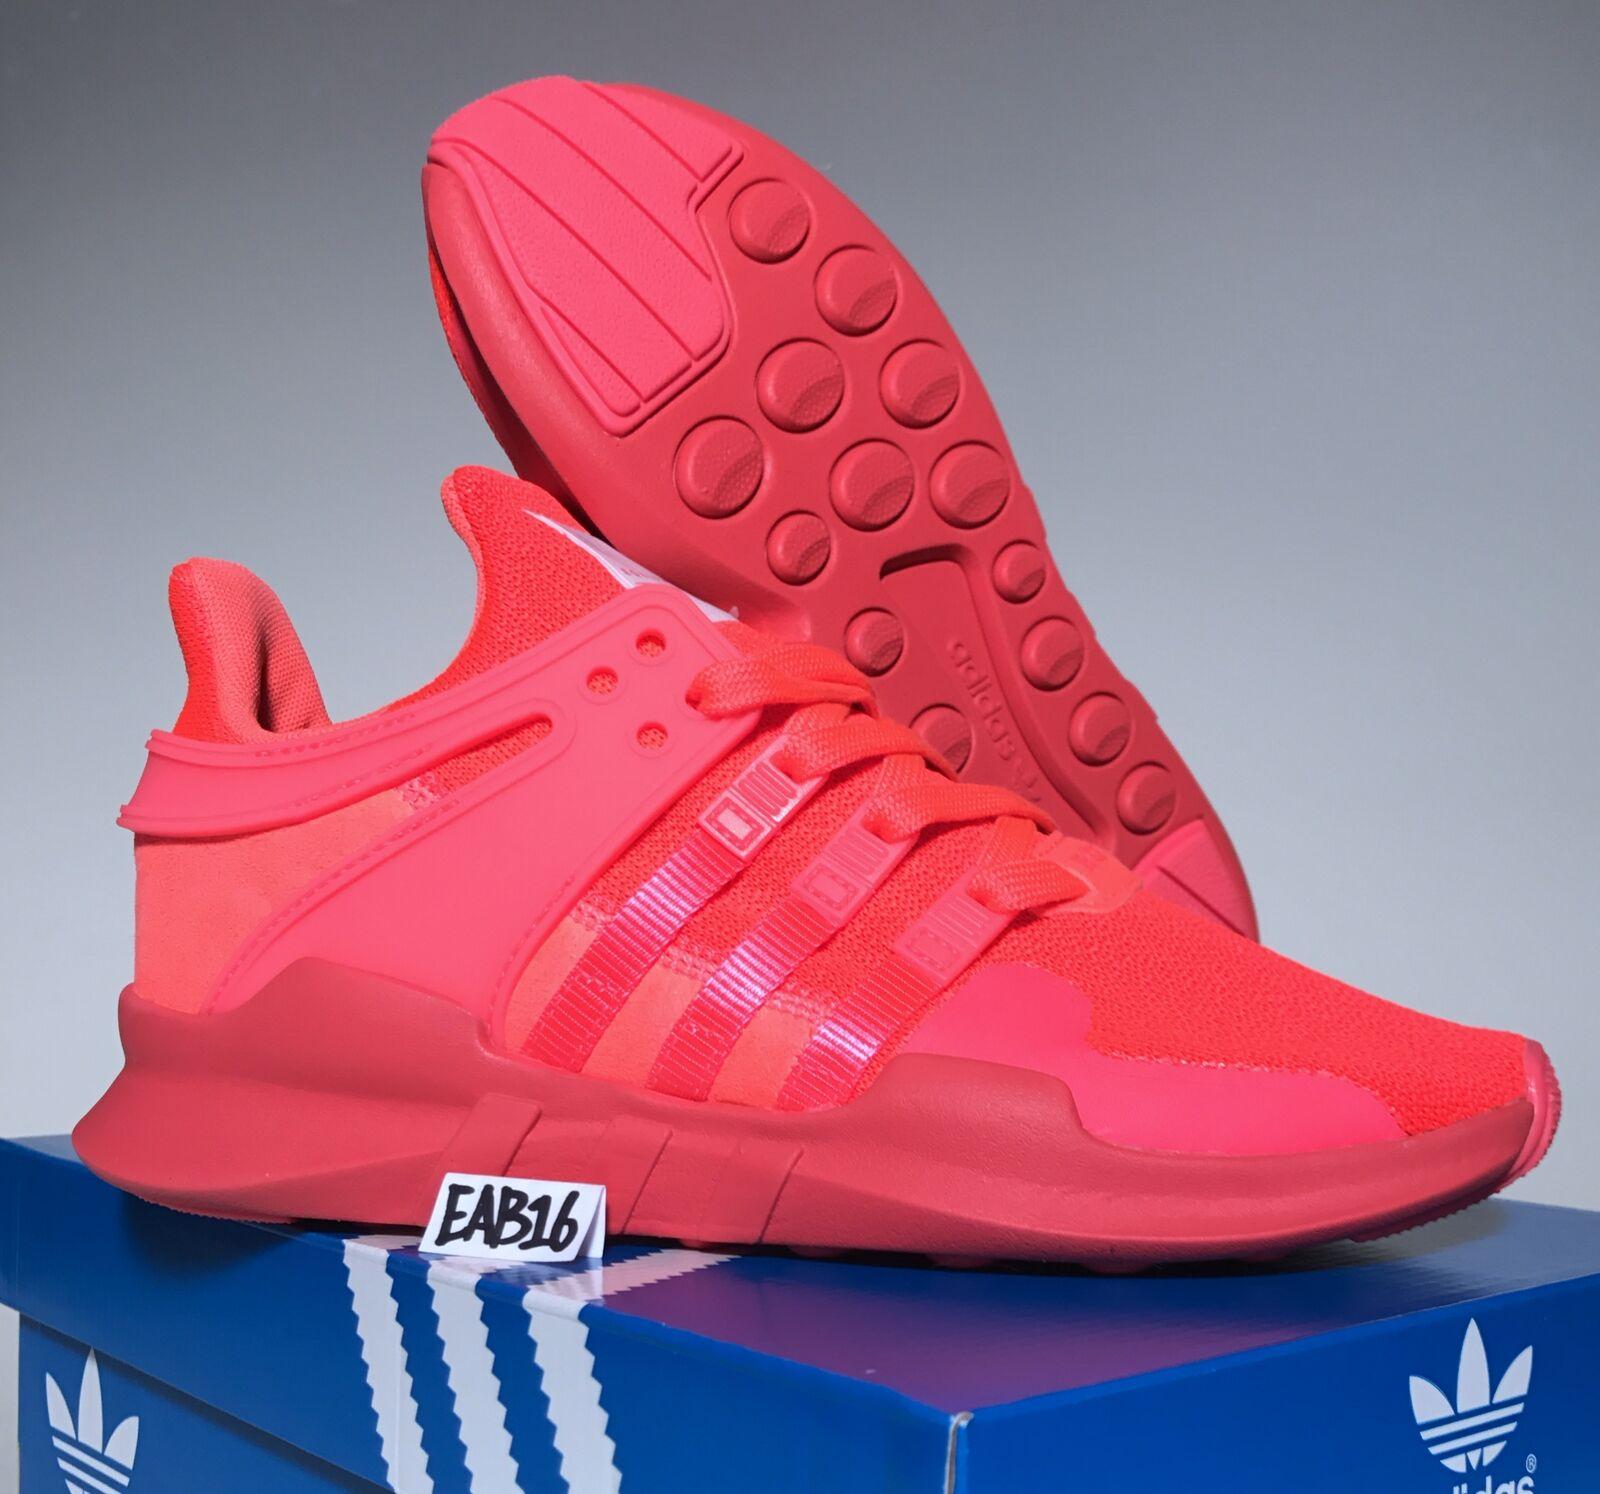 Adidas EQT ADV W Turbo 91 16 BB2326 Womens Girls Equipment Support Pink Red